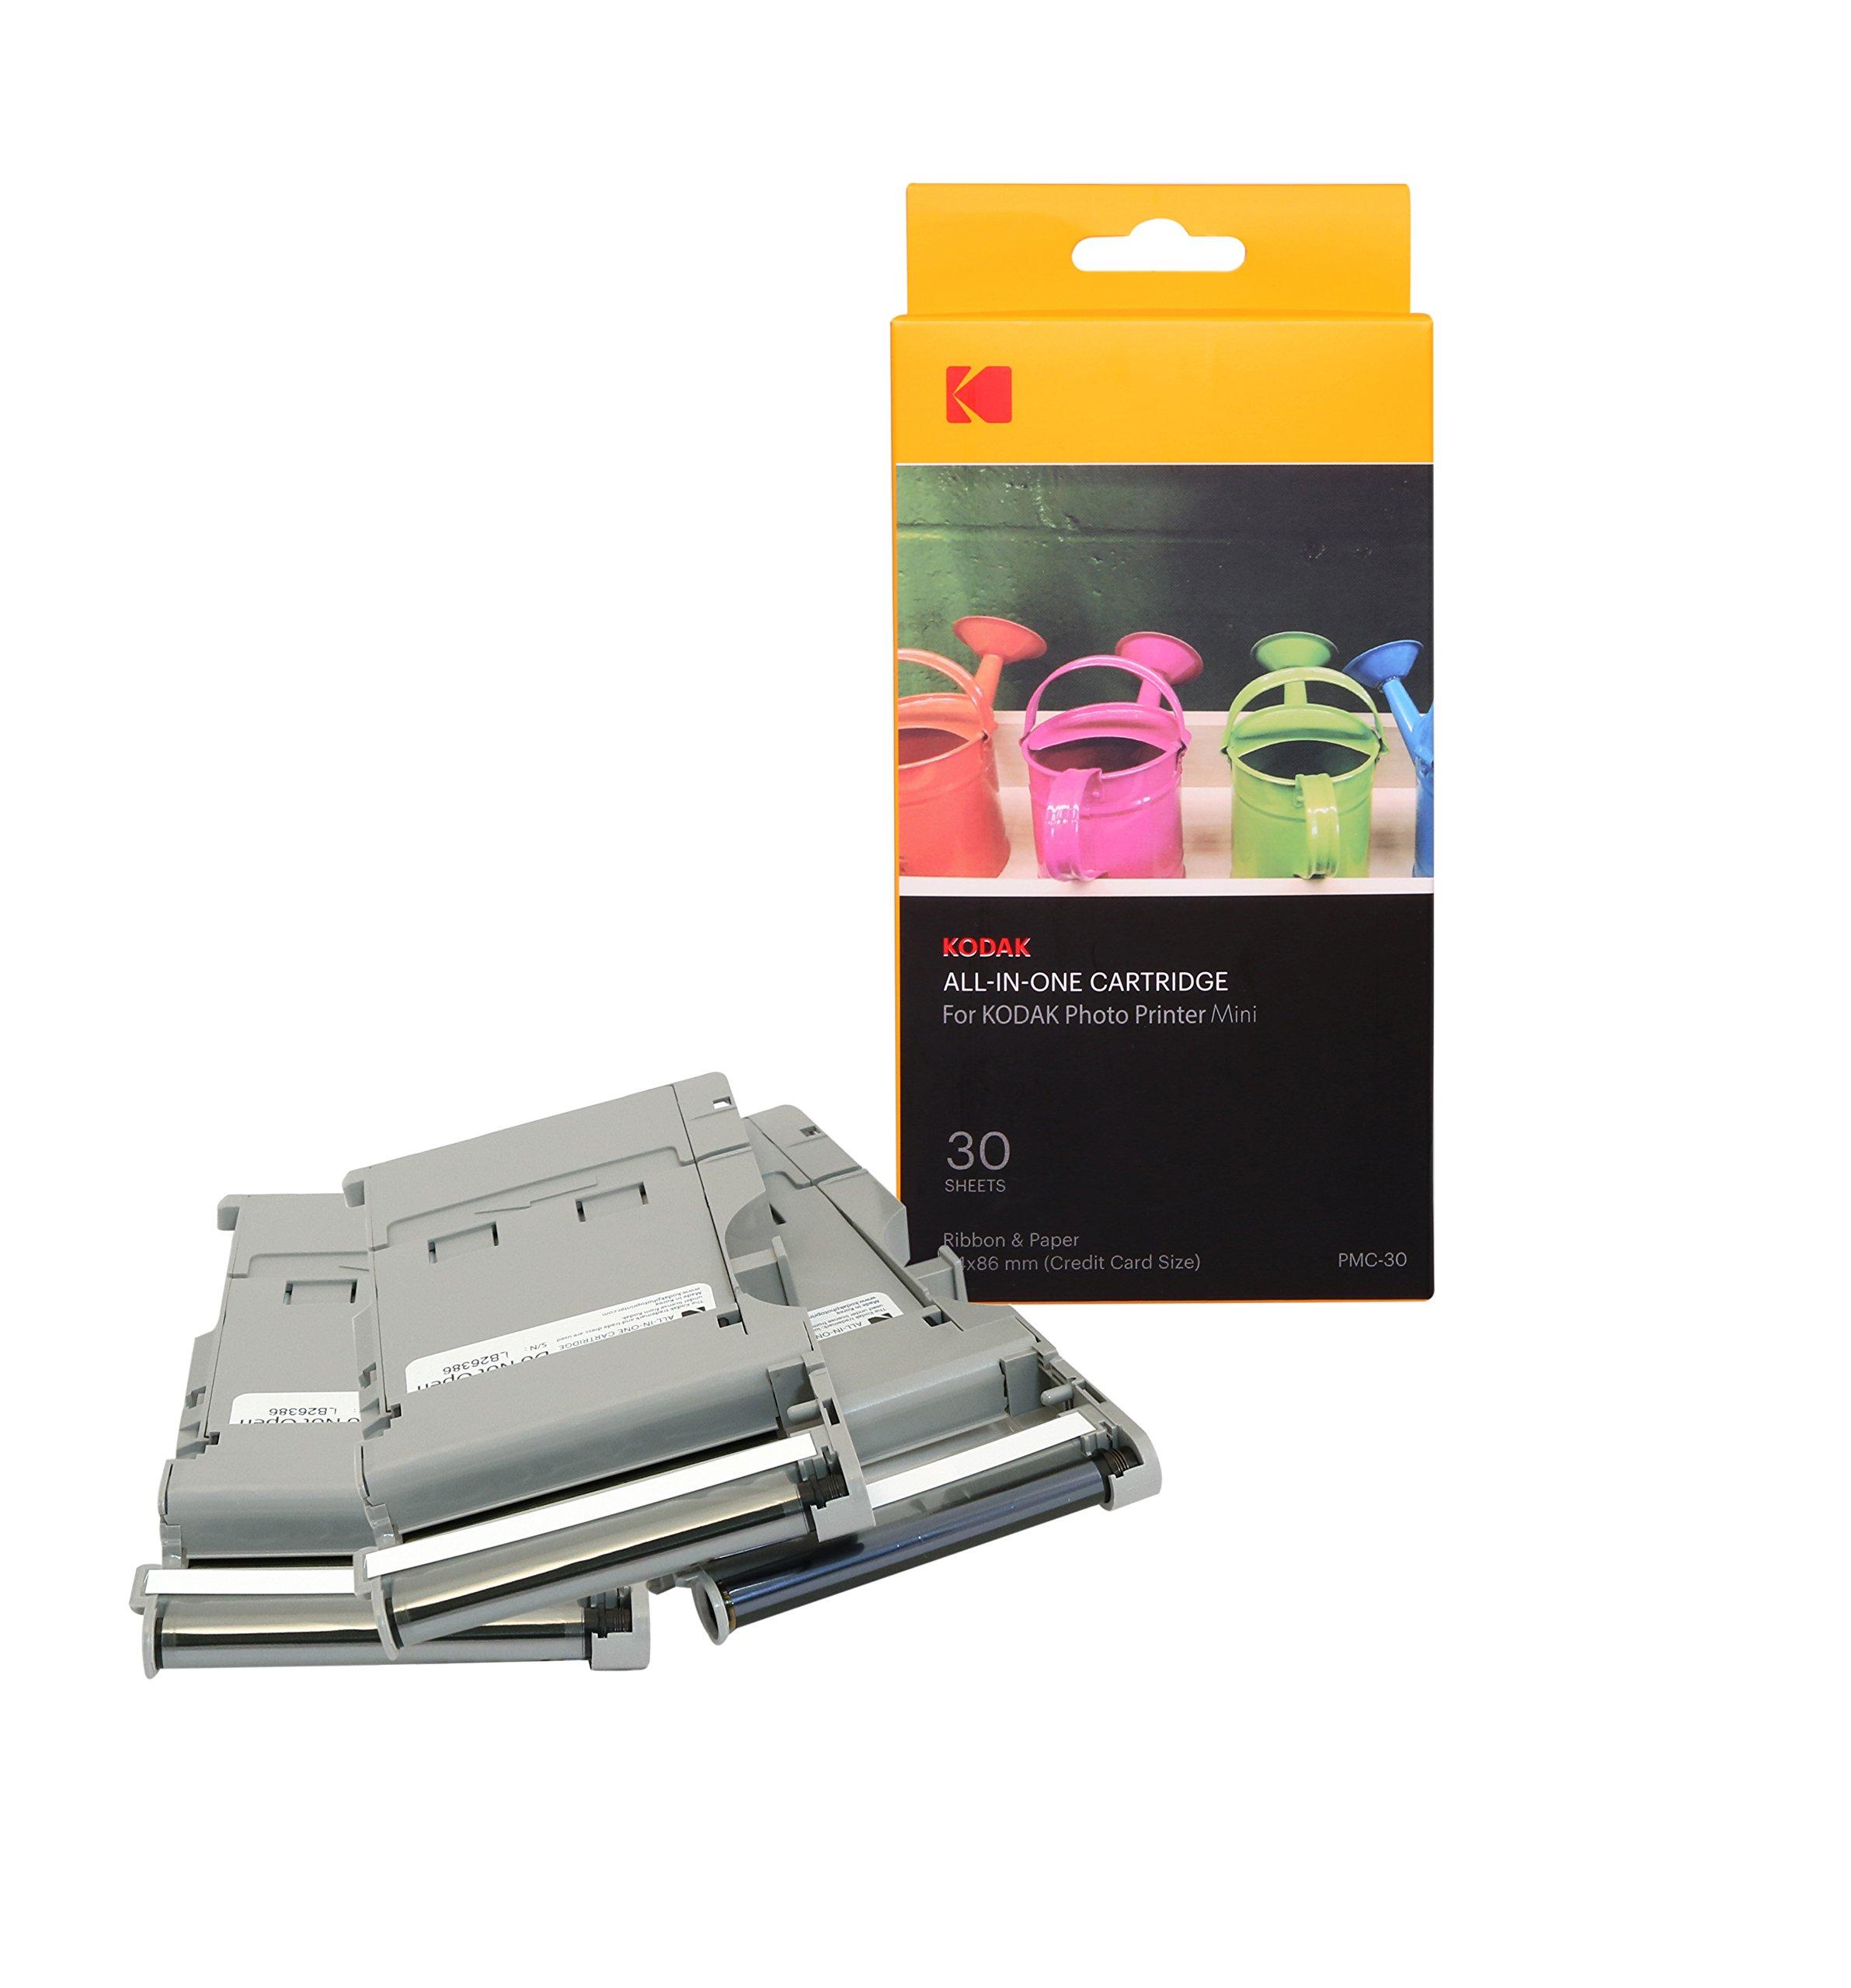 Kodak Mini Photo Printer Cartridge PMC